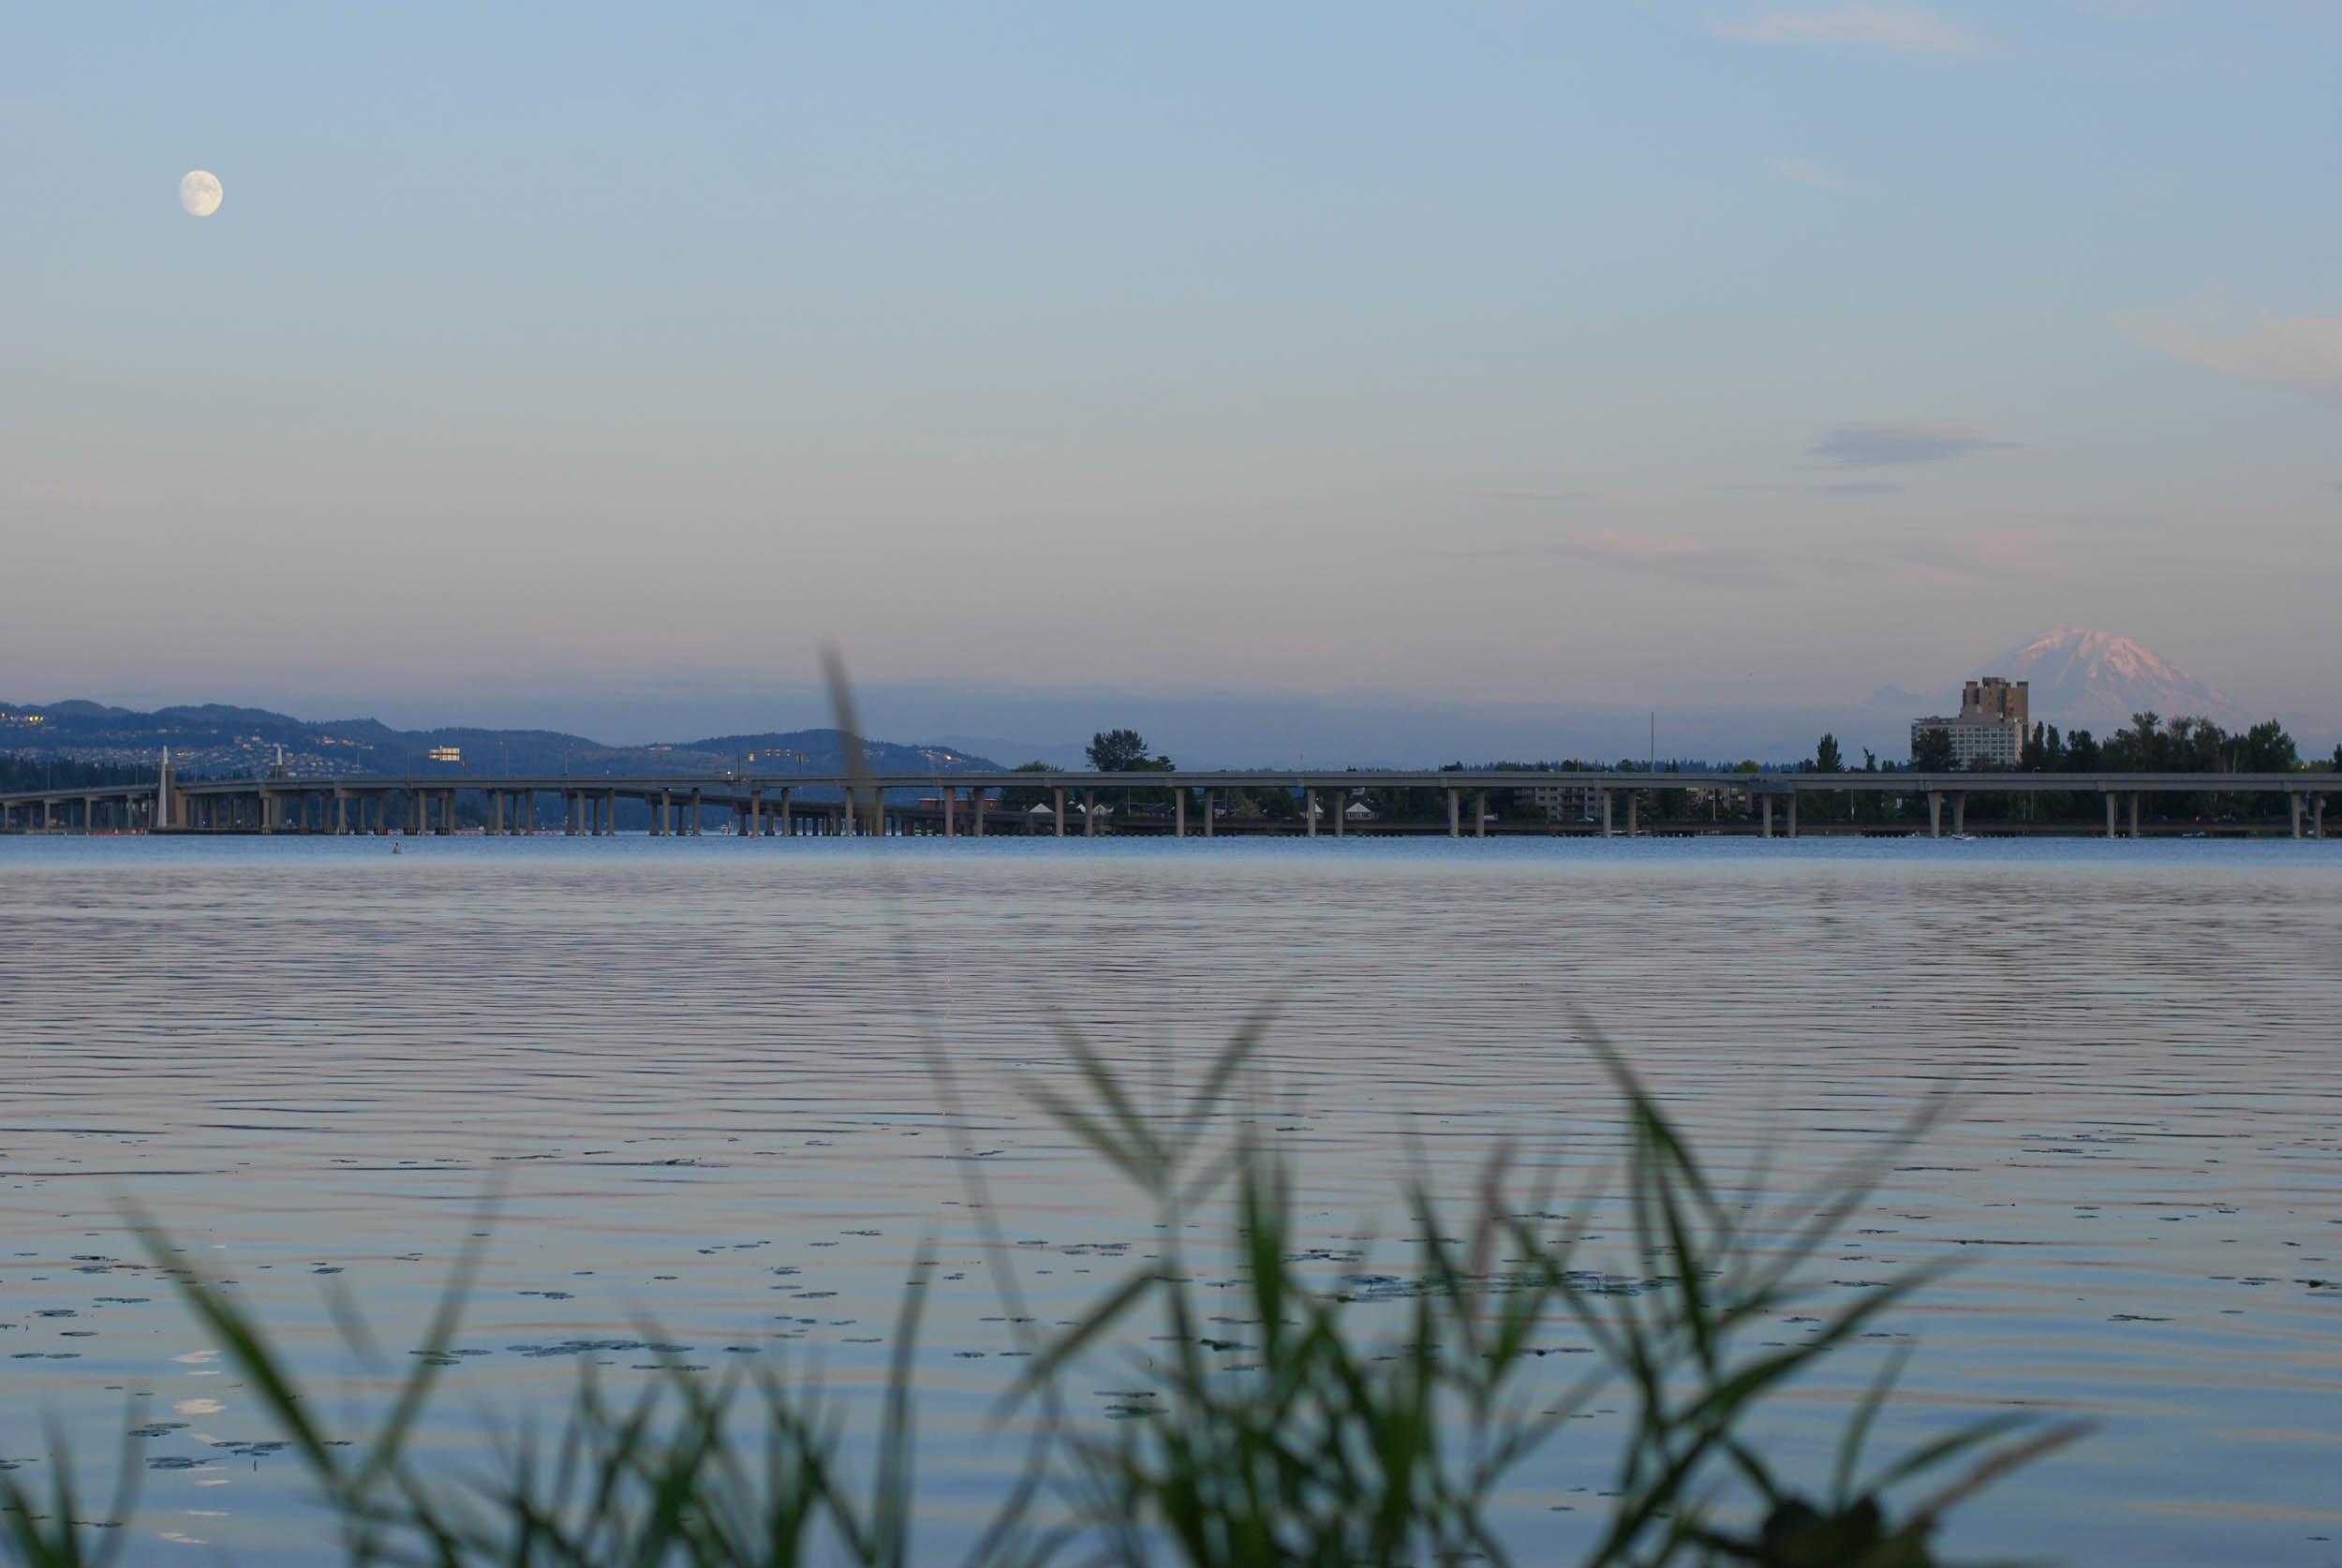 moonrise over Union Bay